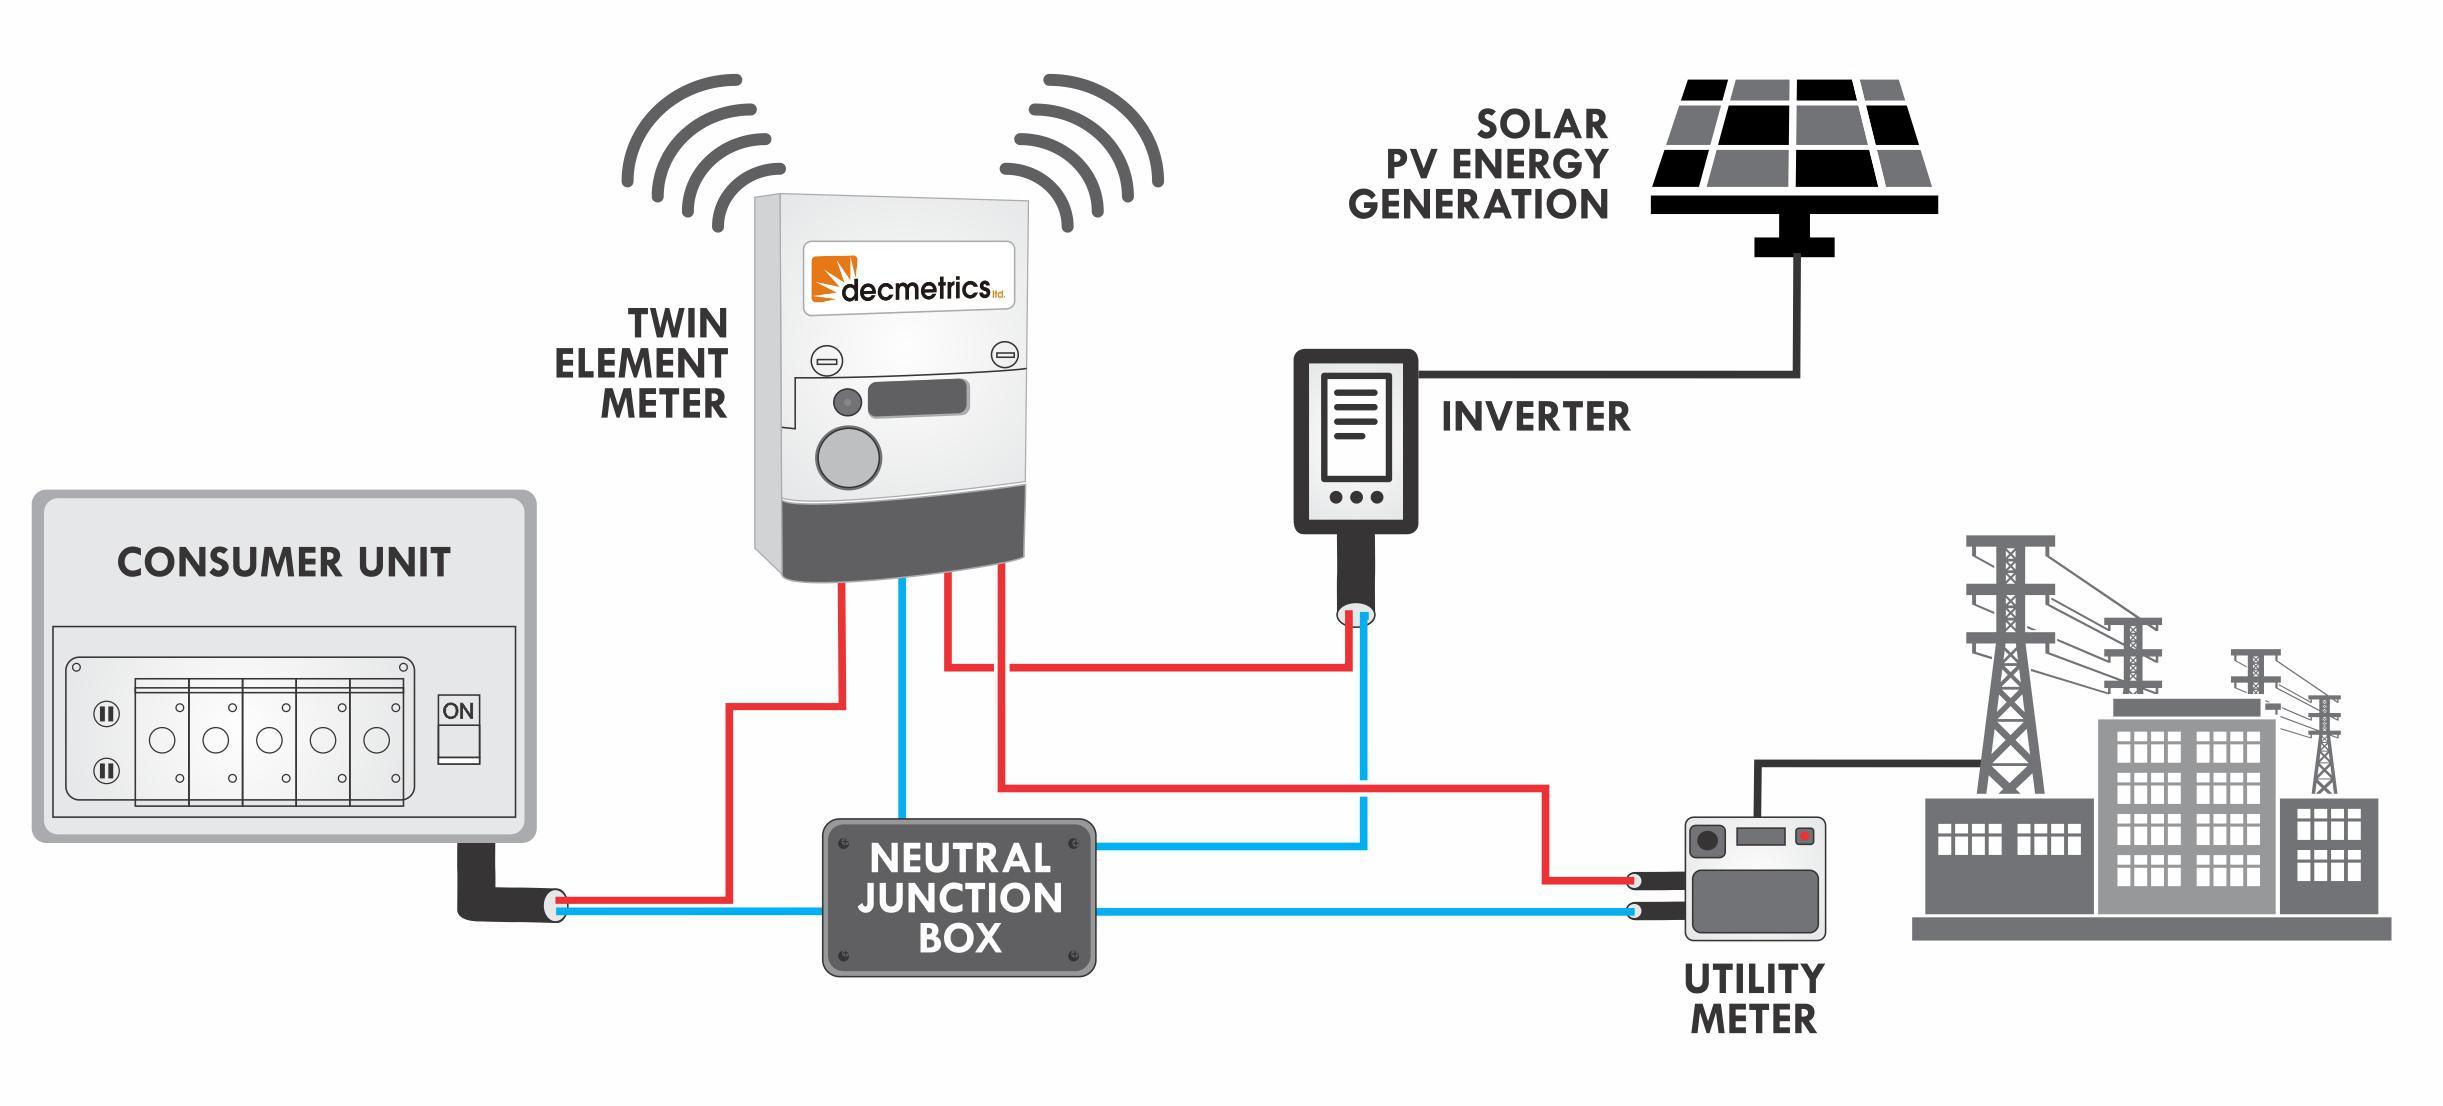 hight resolution of solar pv solar pv net metering schematic diagram solar net metering wiring diagram solar metering wiring